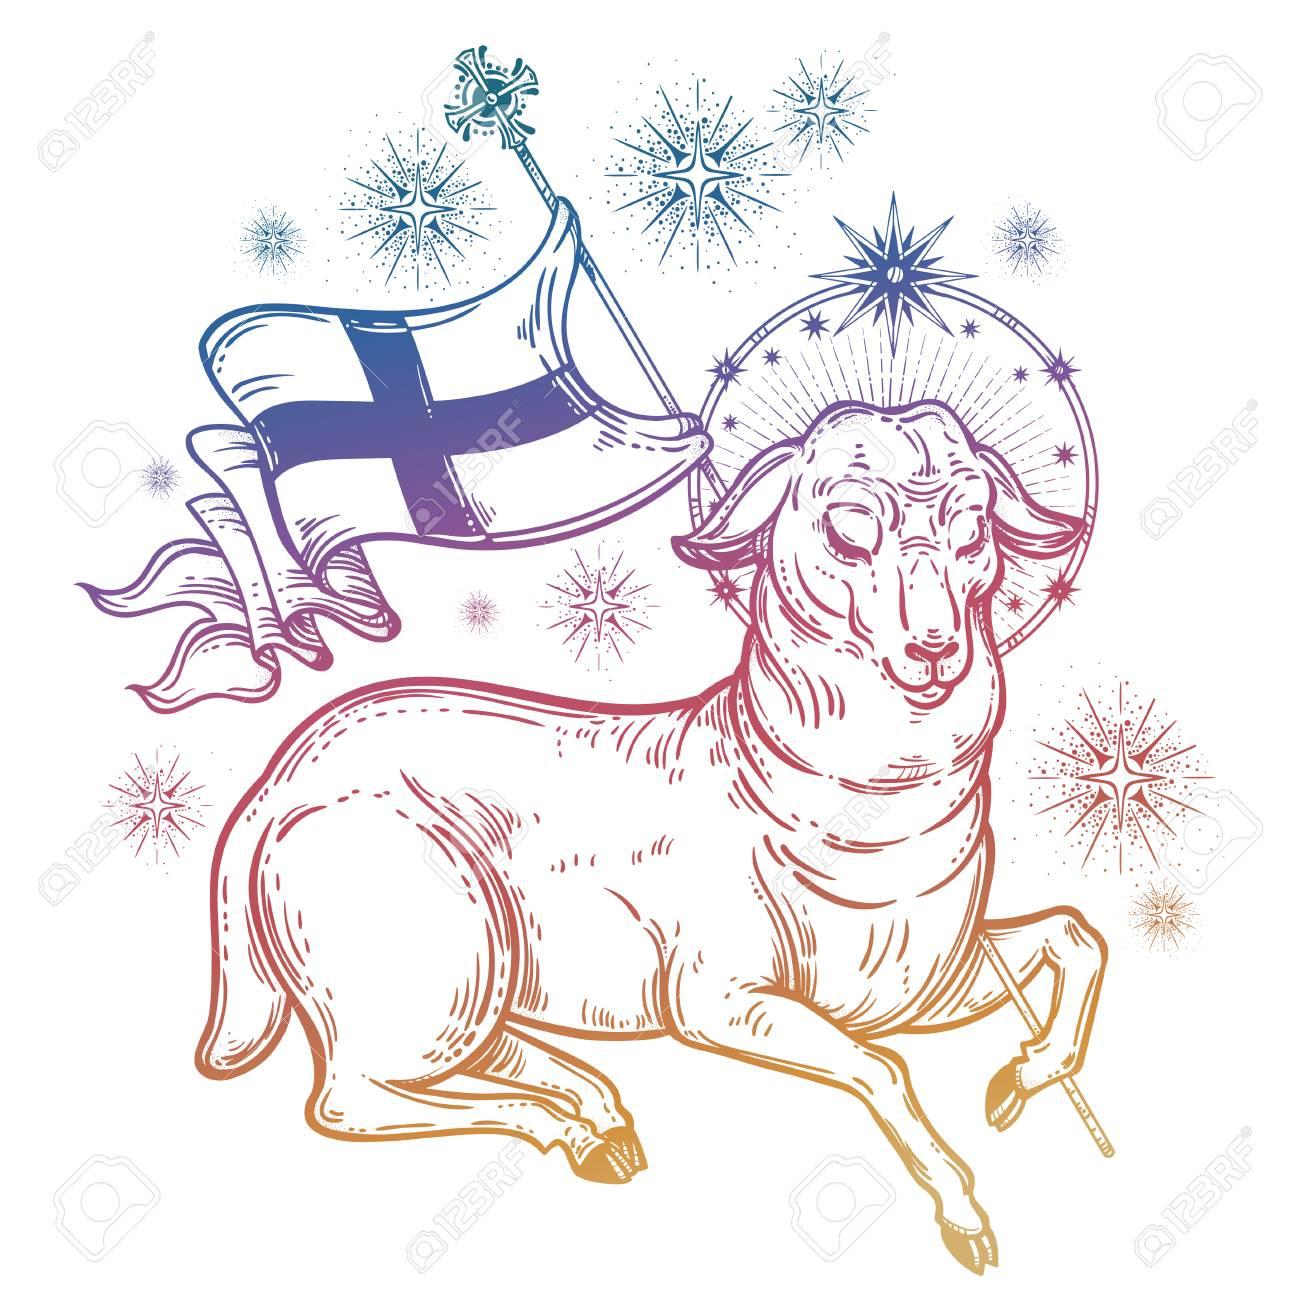 Lamb Of God Christian Symbol Royalty Free Cliparts Vectors And